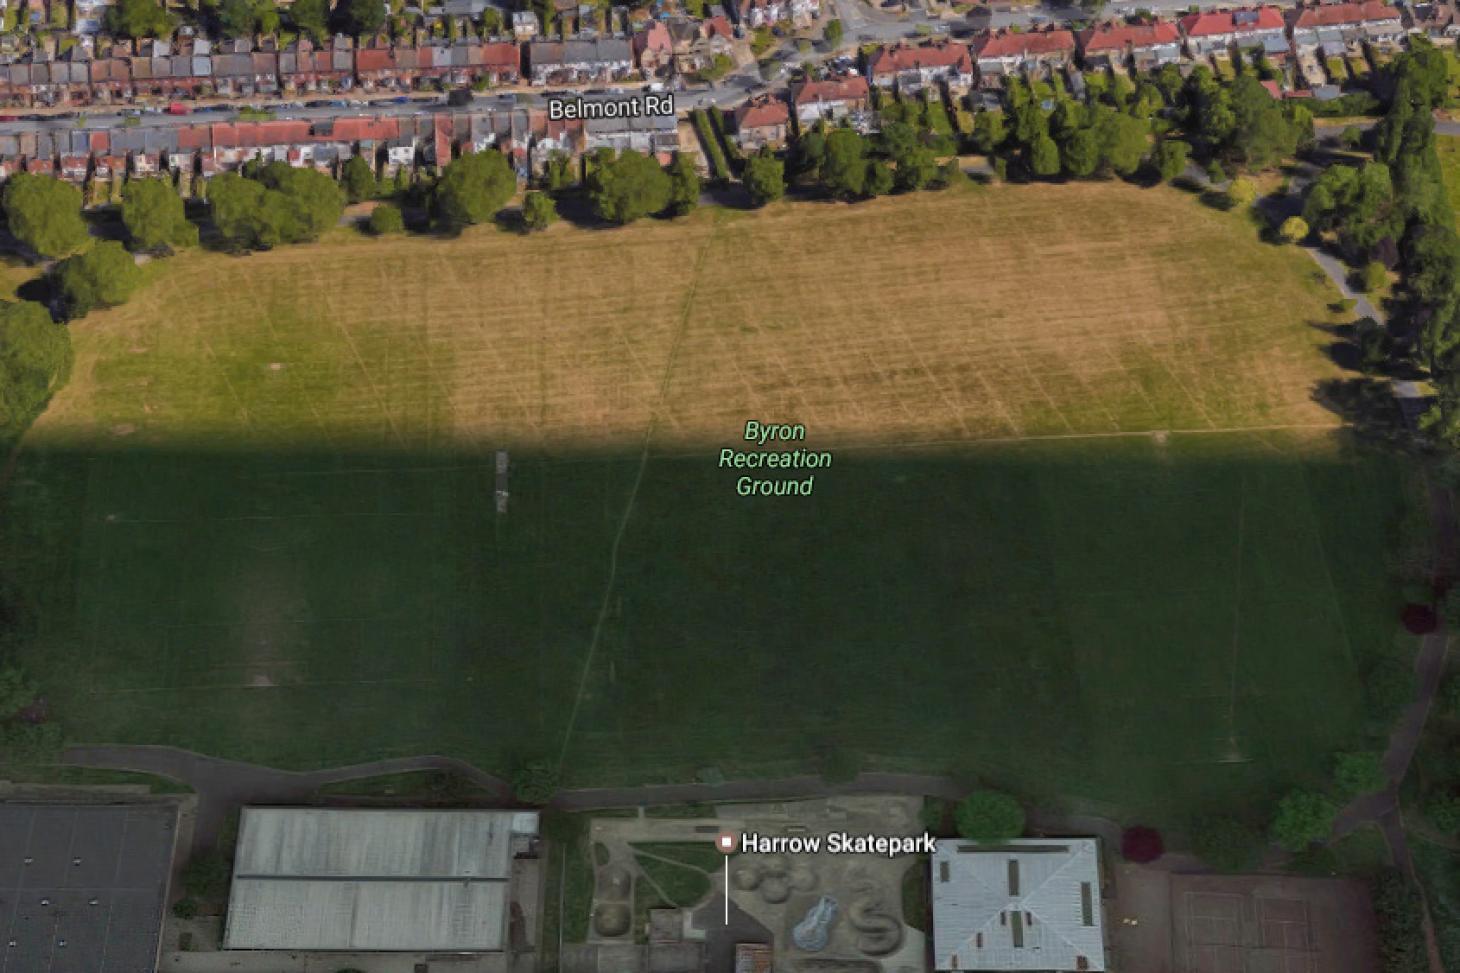 Byron Recreation Ground 11 a side | Grass football pitch